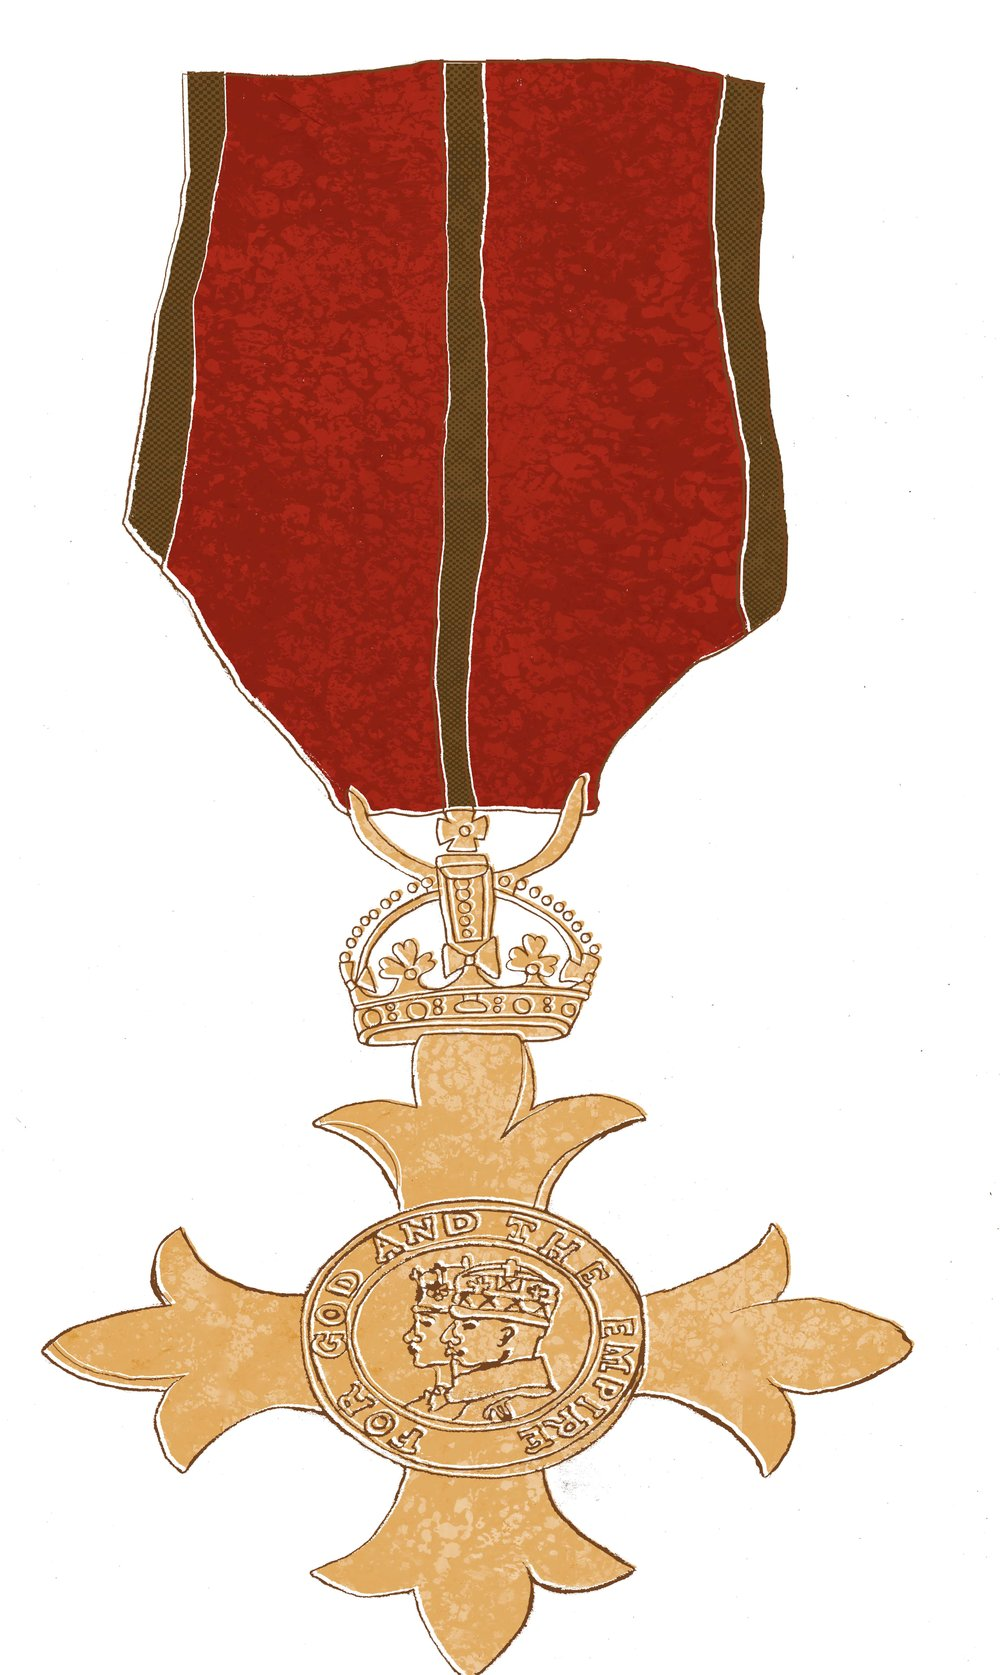 Robert's OBE